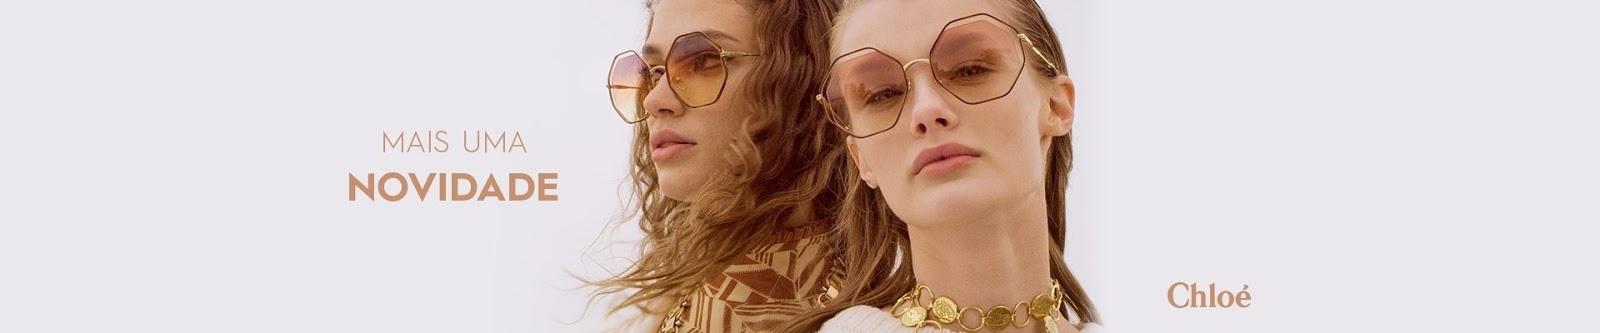 8a1f7c00a Percebemos, nestes modelos de óculos de sol Chloé , o design leve da marca,  que ao mesmo tempo deixa a mulher confortável e estilosa ao mesmo tempo.